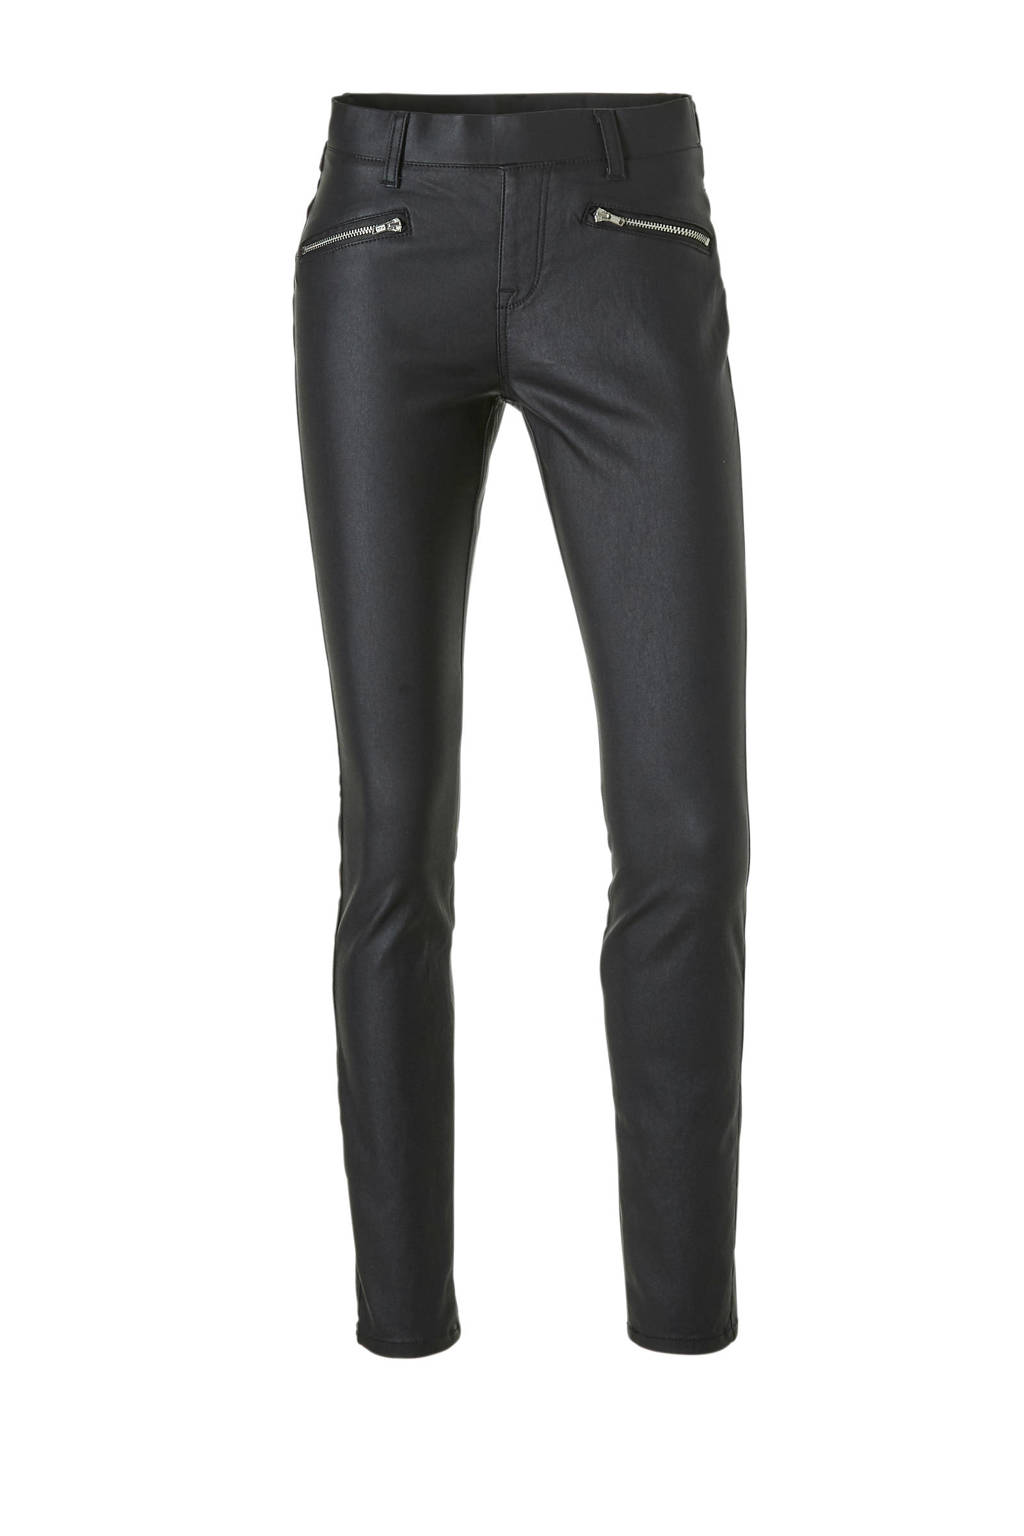 C&A Yessica gecoate slim fit jegging zwart, Black